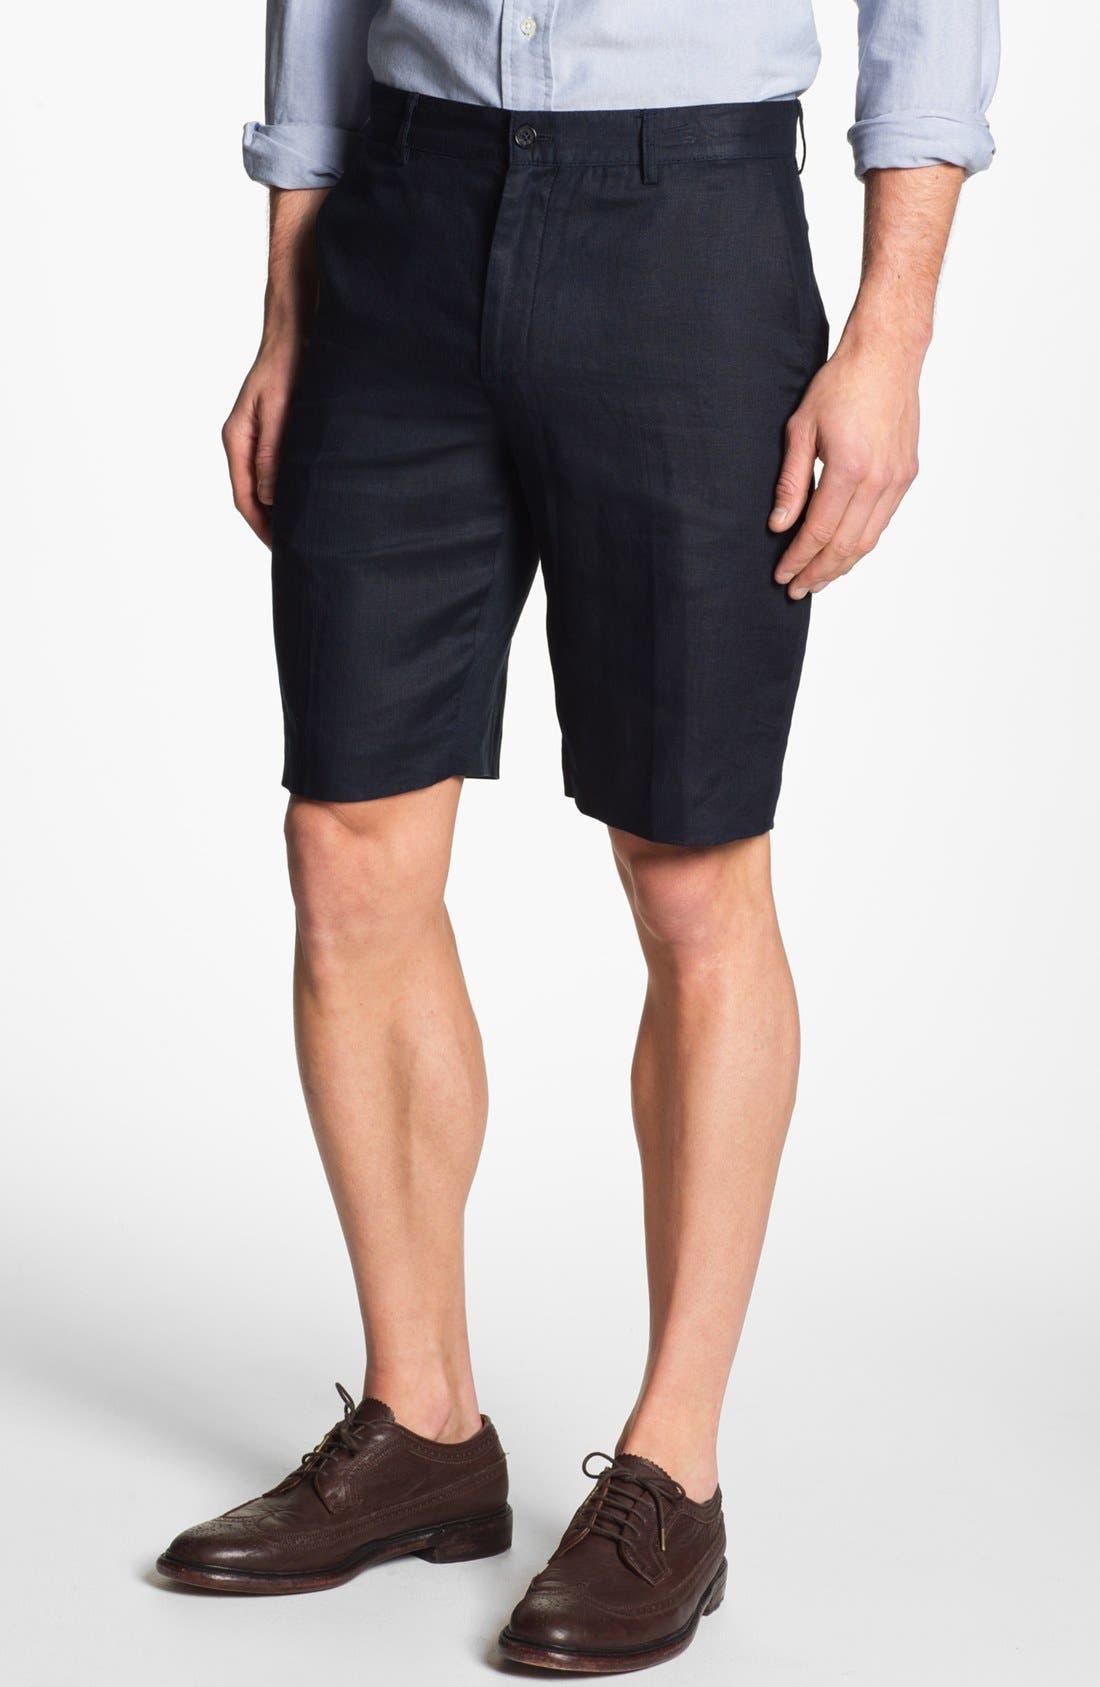 Alternate Image 1 Selected - Michael Kors Linen Shorts